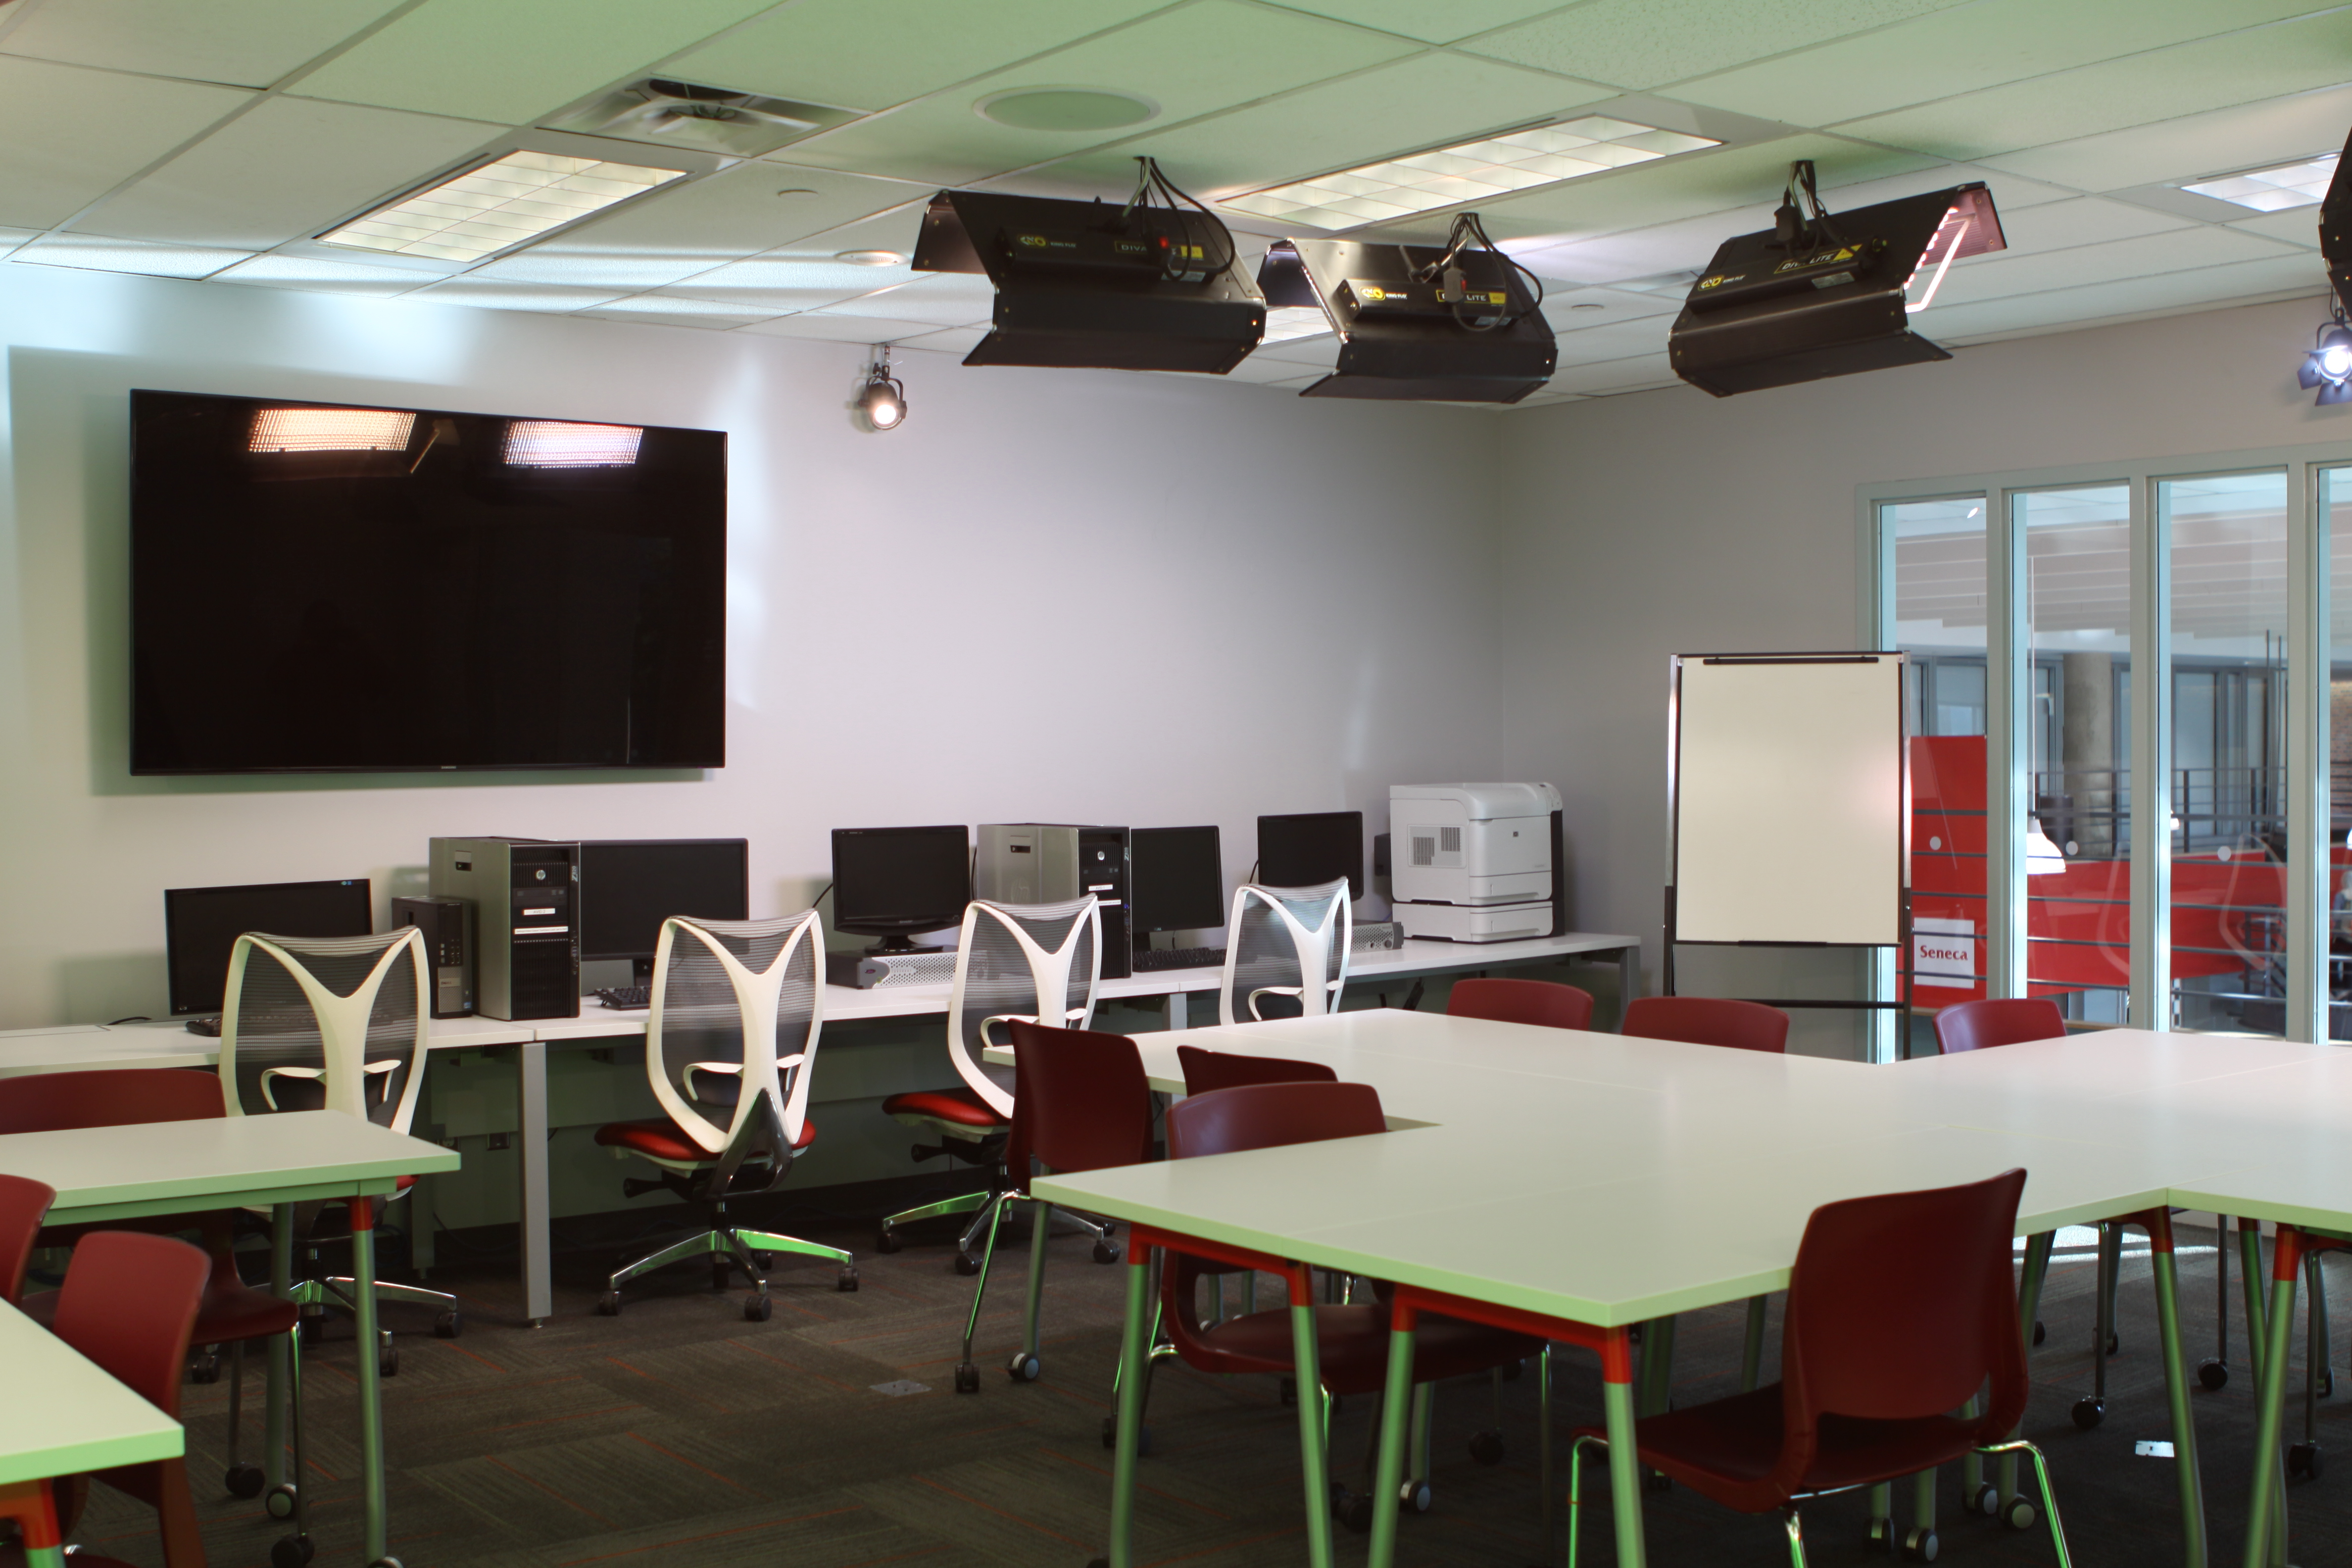 Seneca College @ York University School of Media, Faculty of Communication, Art and Design Classroom